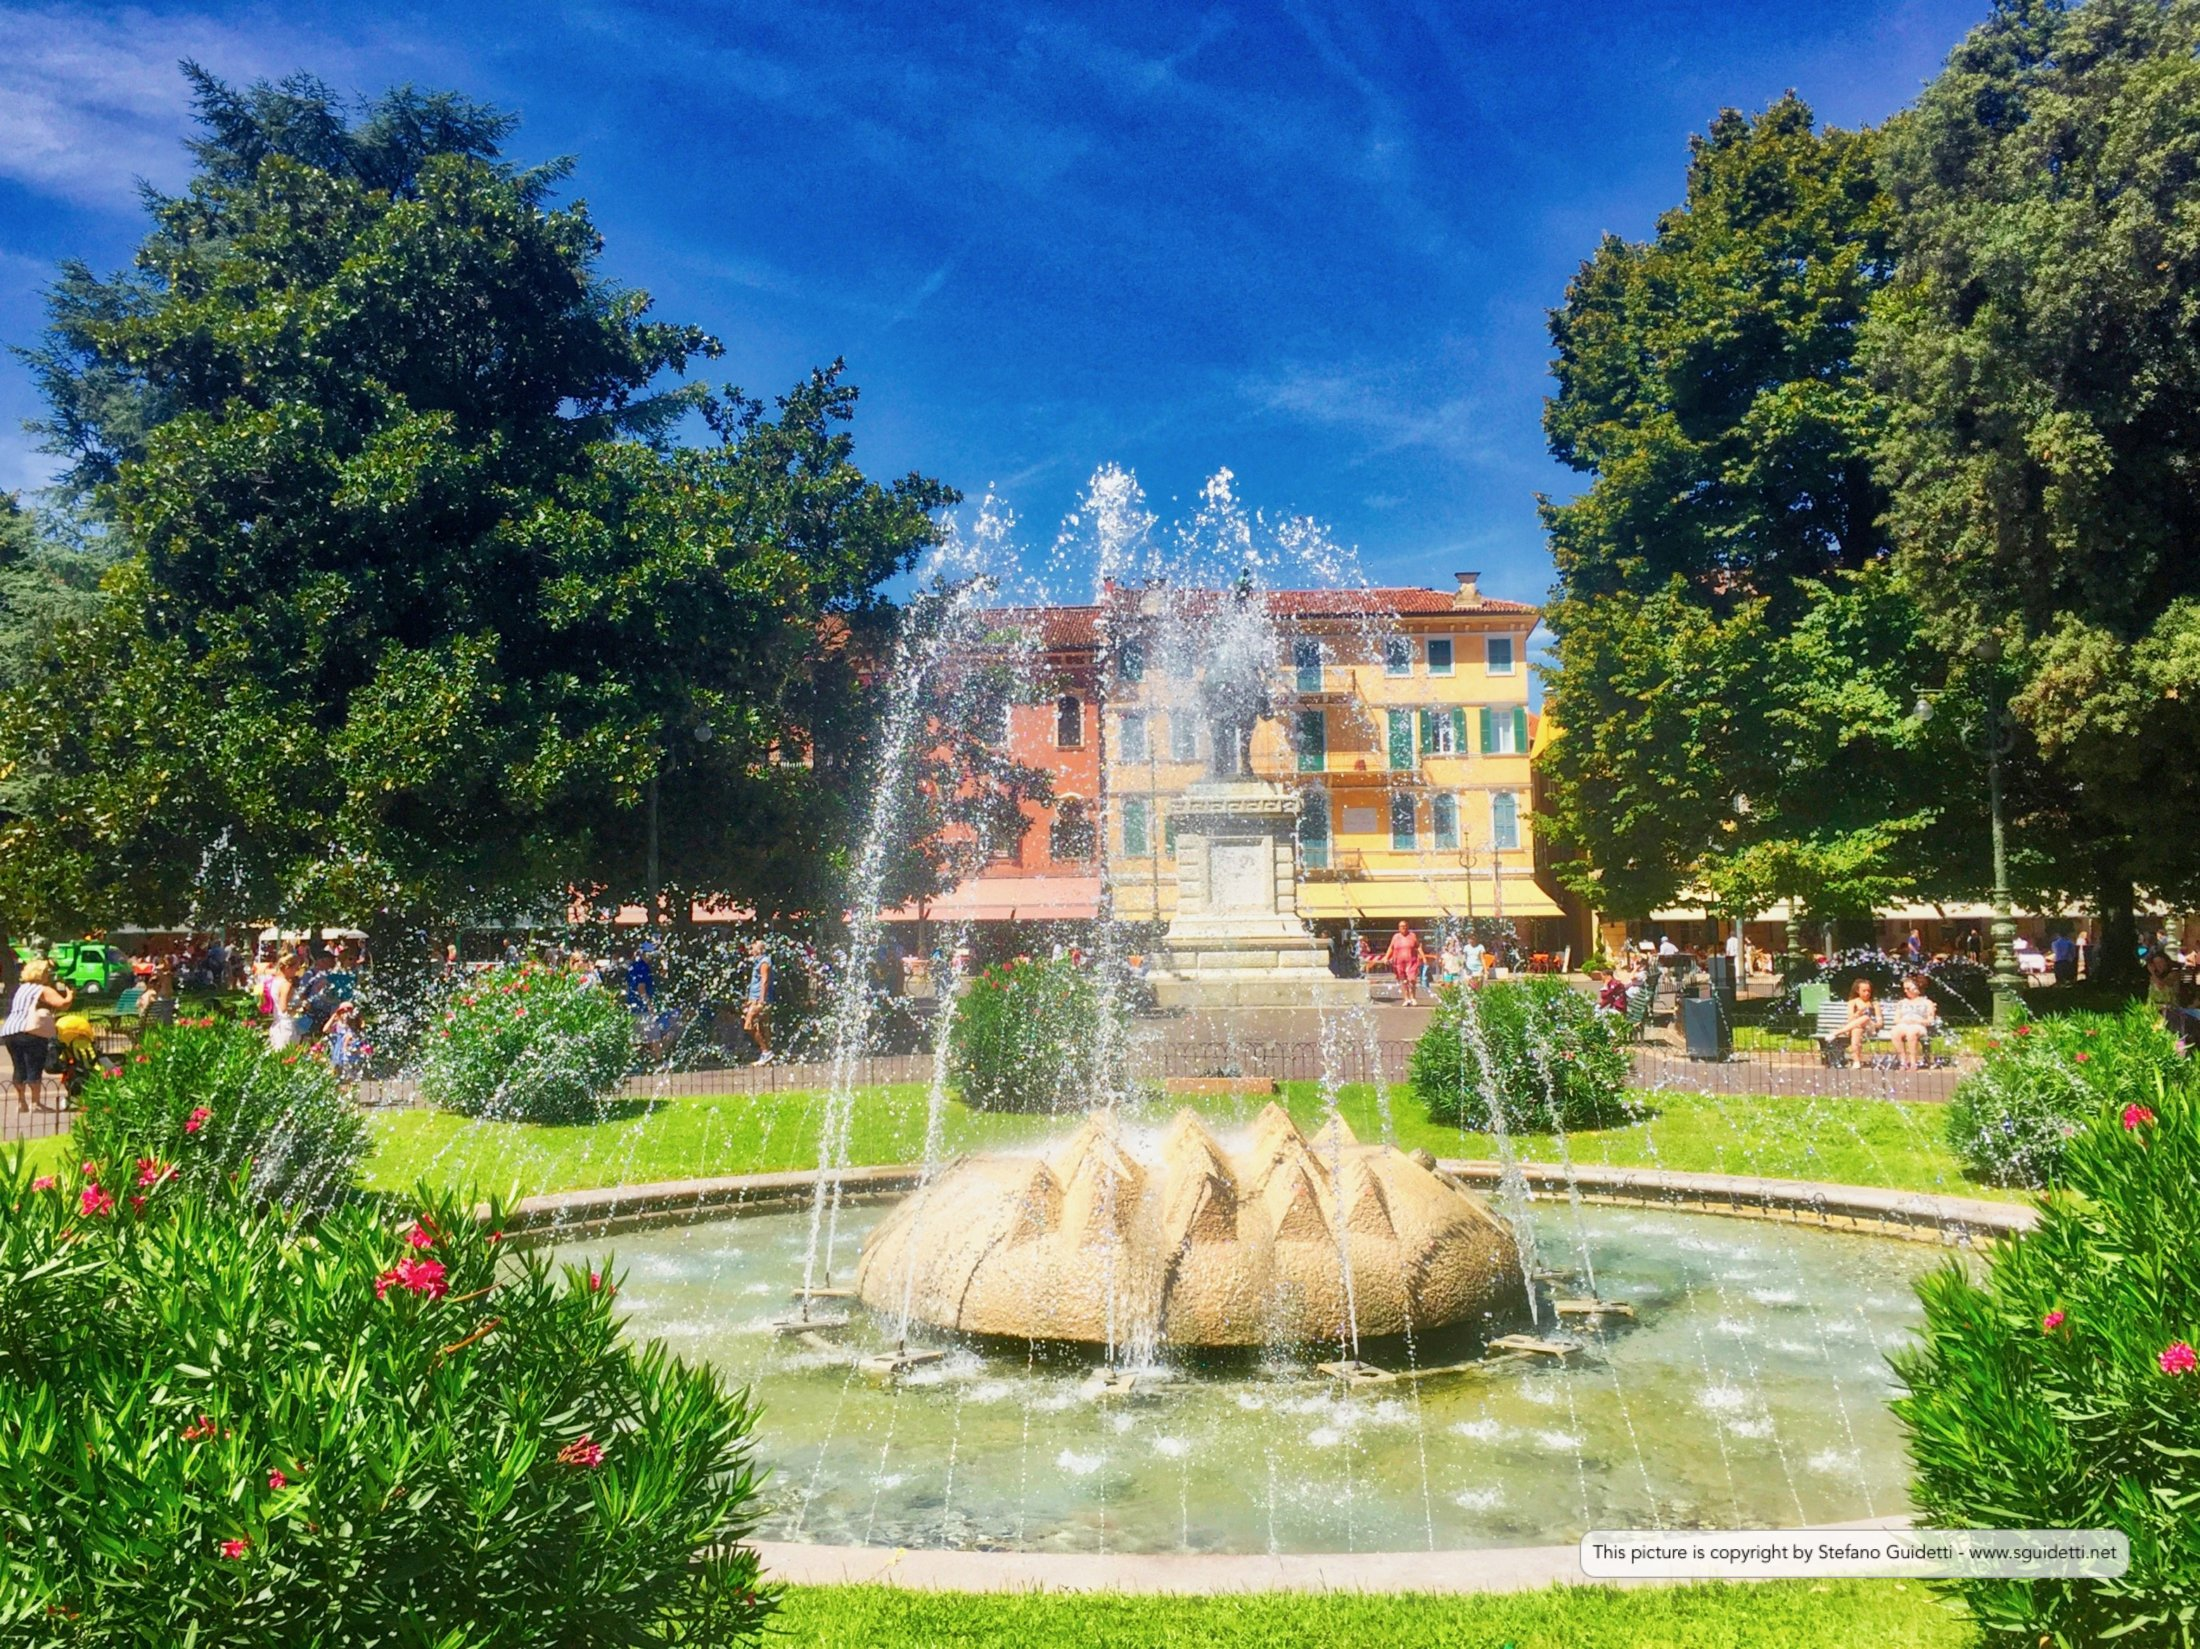 Giardini di Piazza Bra